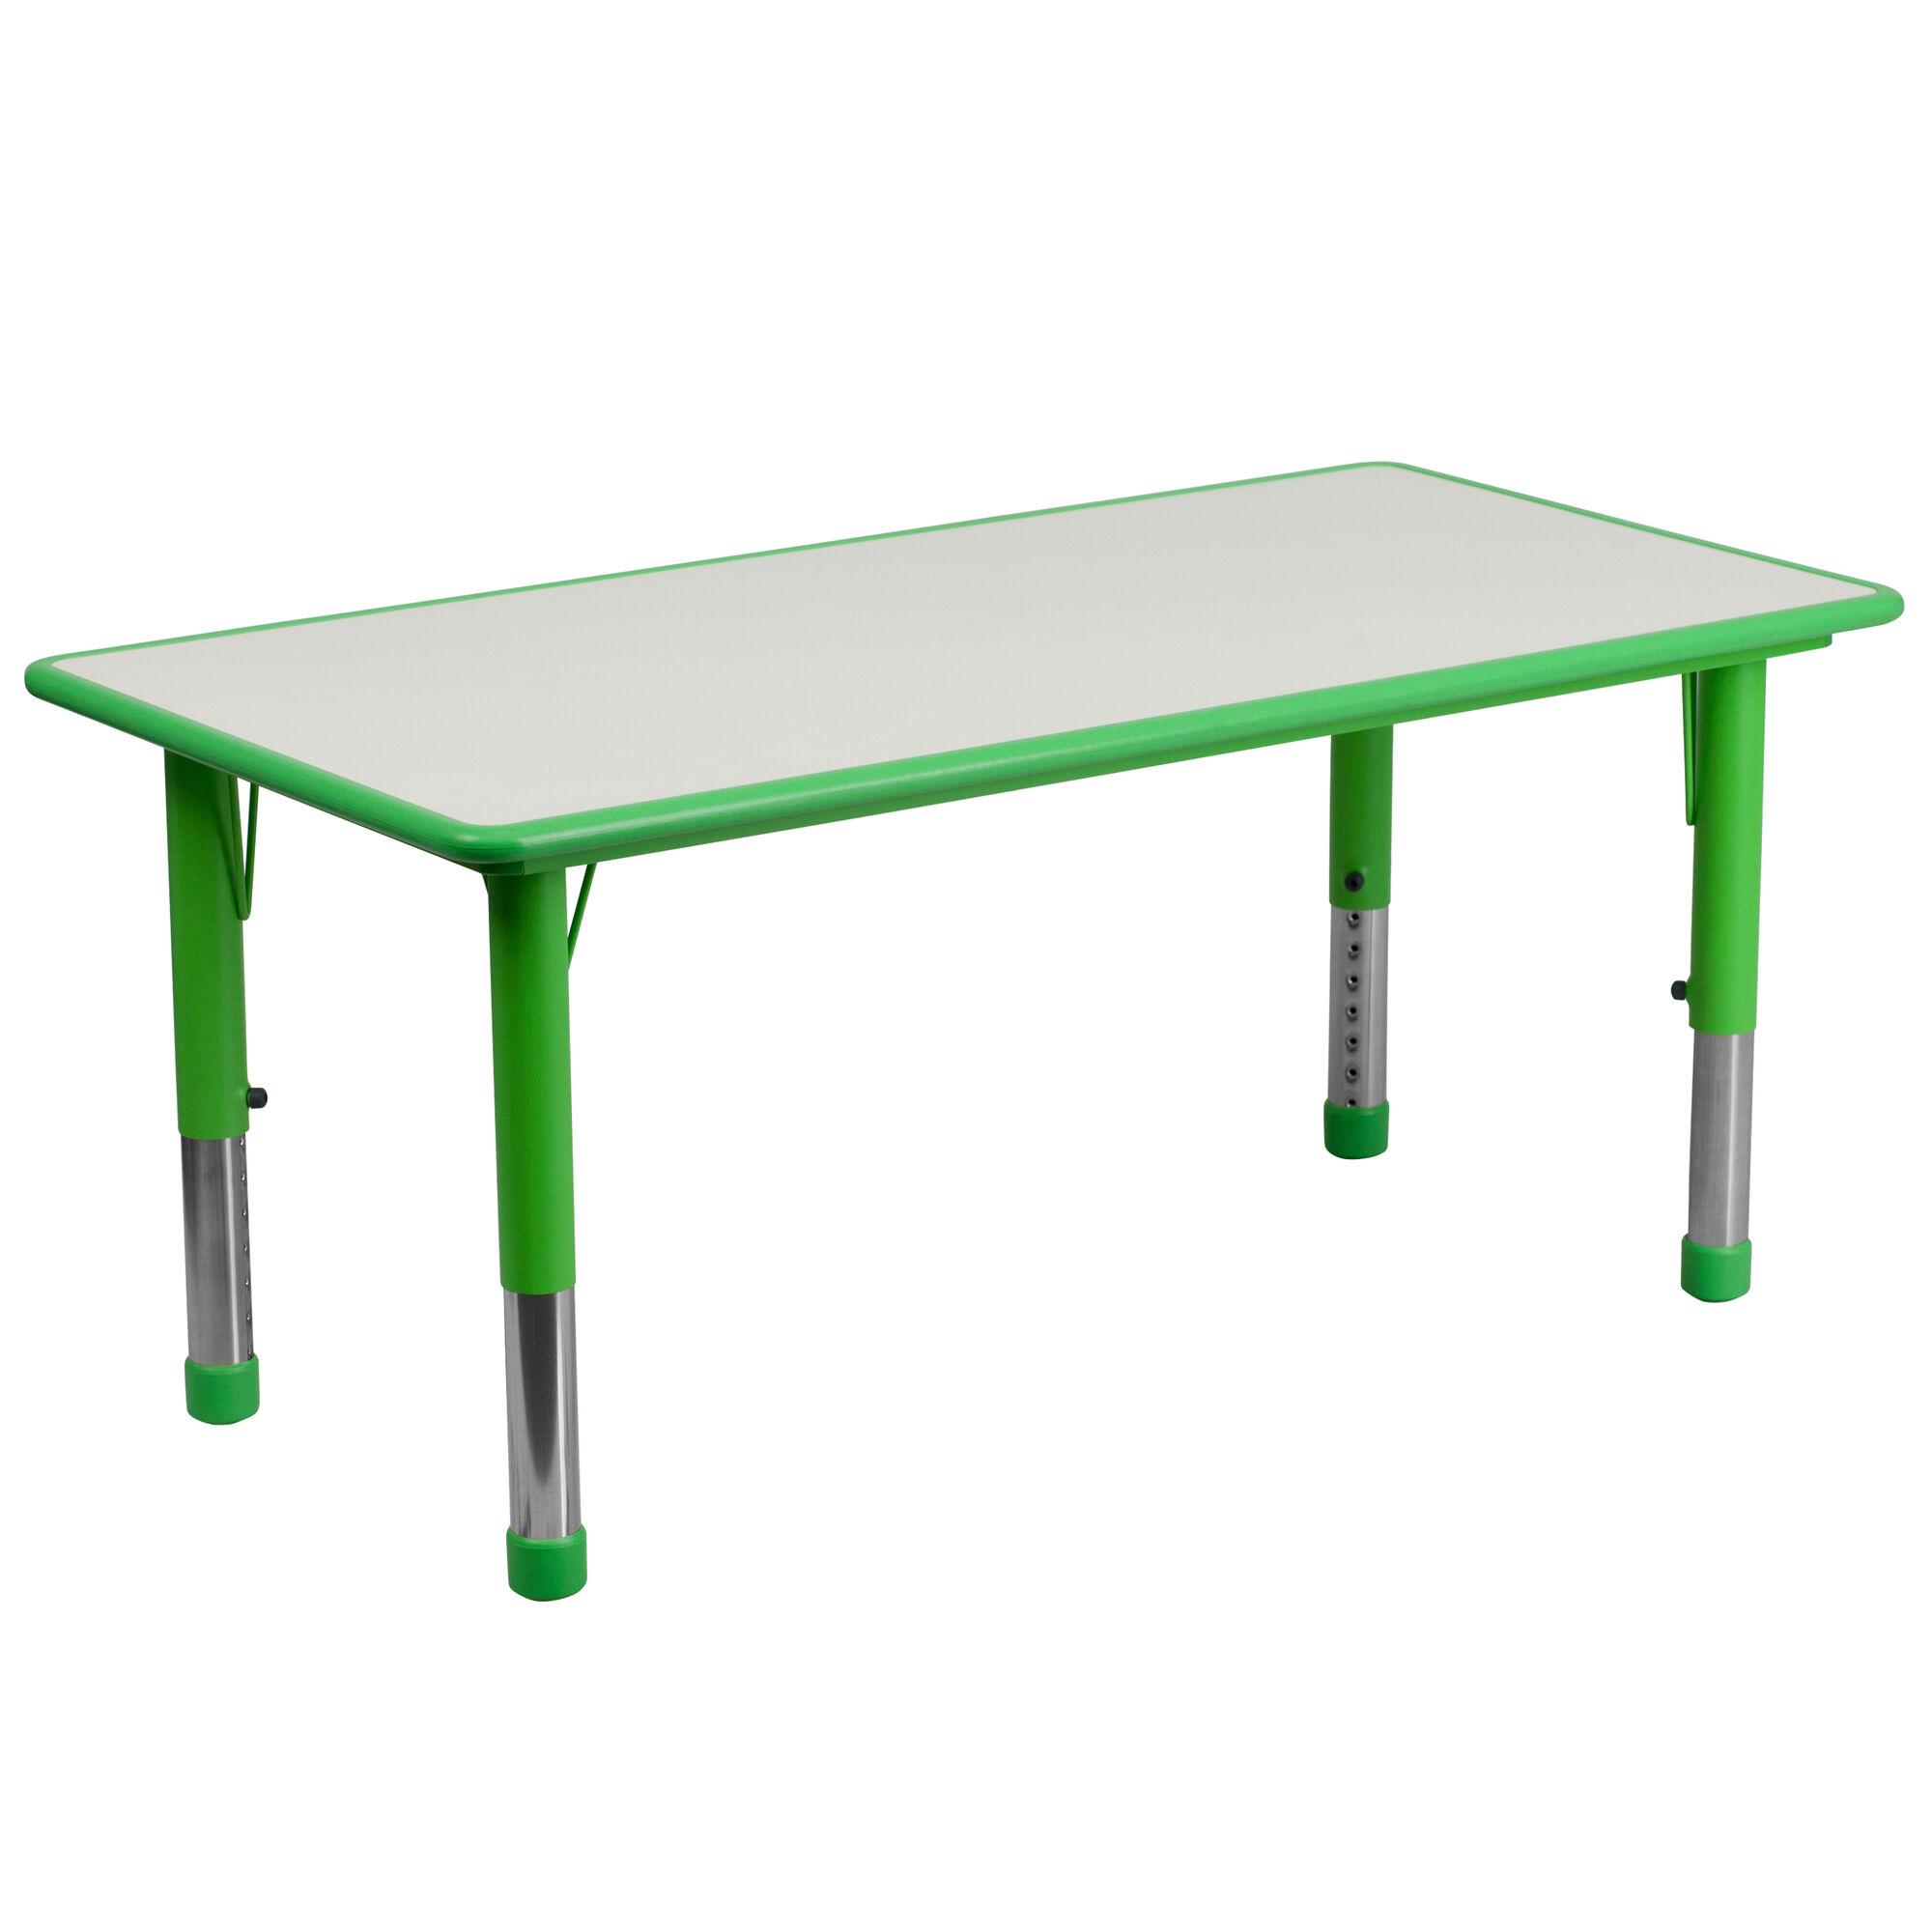 Green Preschool Activity Table Yu Ycy 060 Rect Tbl Green